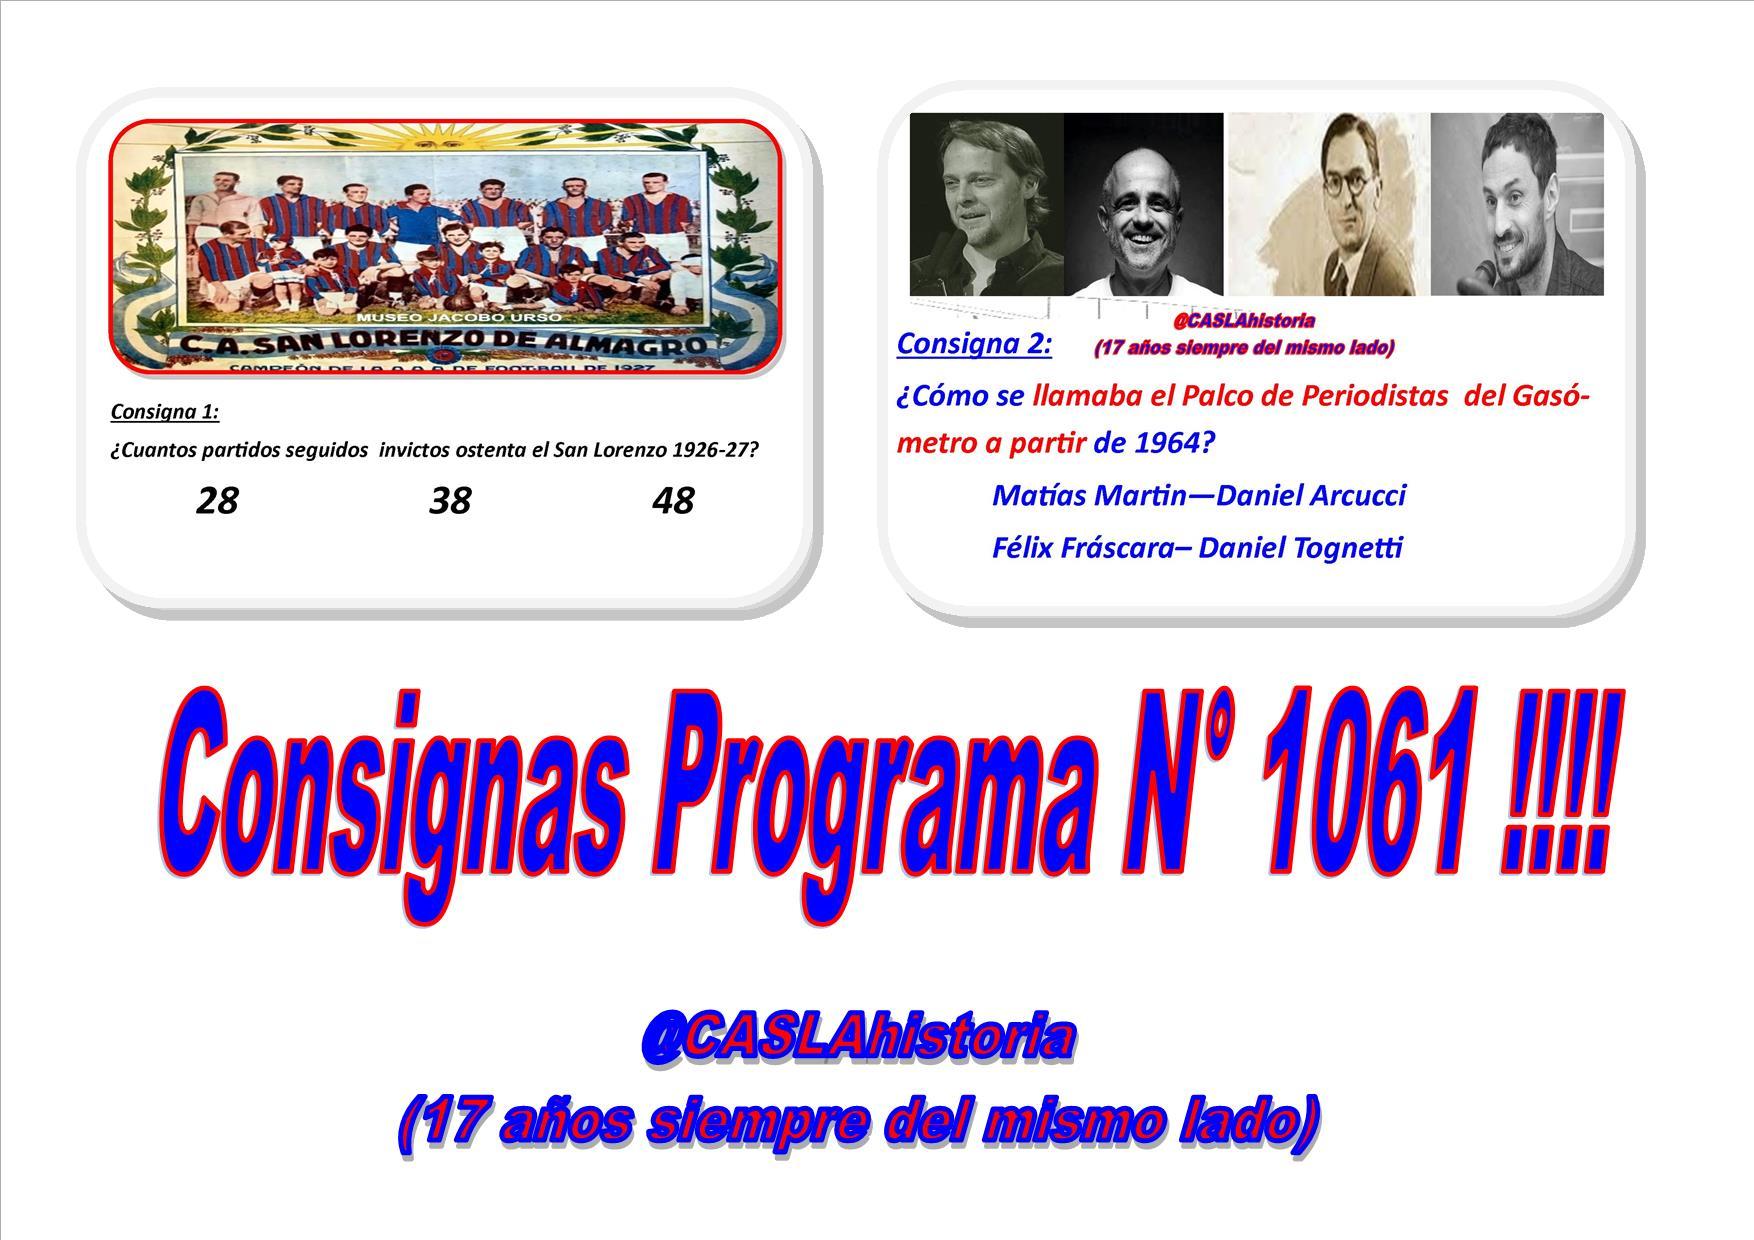 Consignas Programa N° 1061 !!!!!